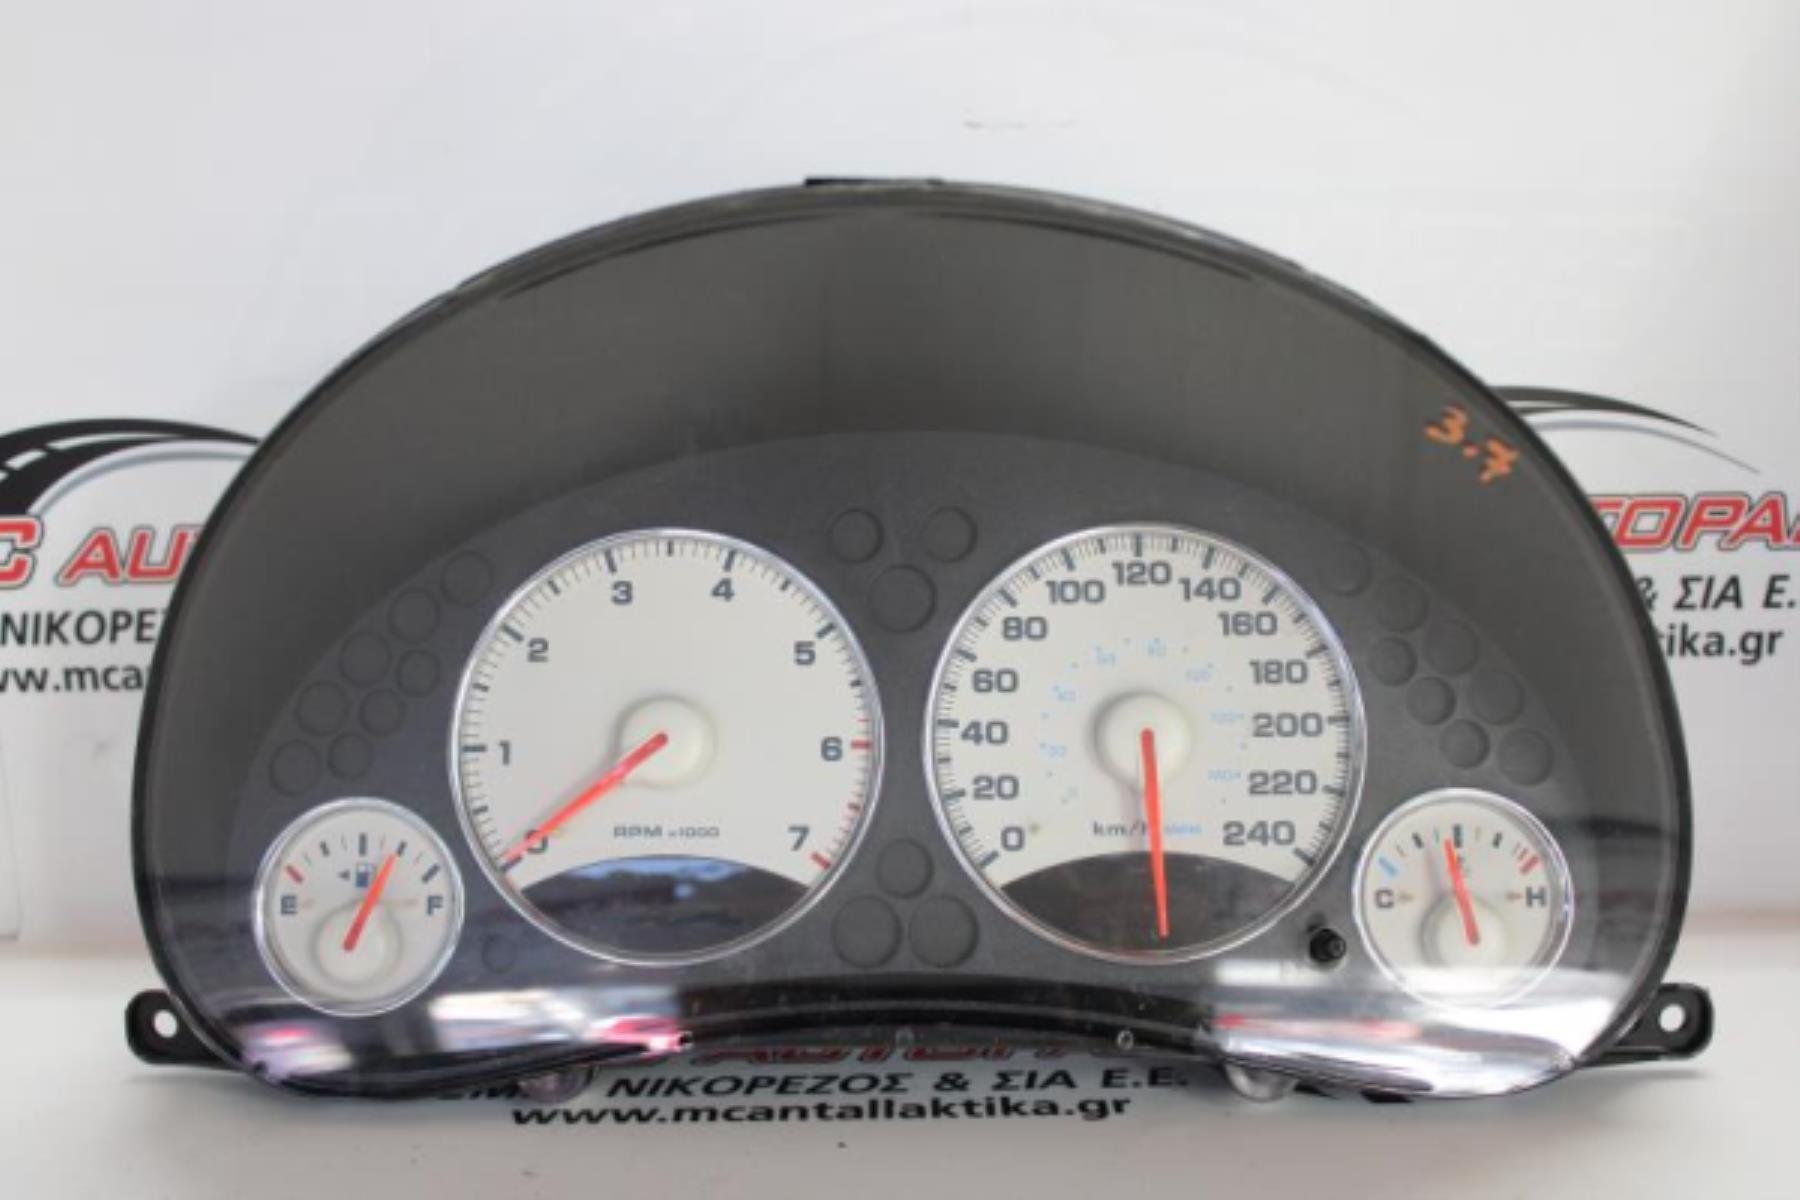 Picture of Όργανα - Κοντέρ  JEEP CHEROKEE (2002-2008)  P56010462AF   βενζίνη